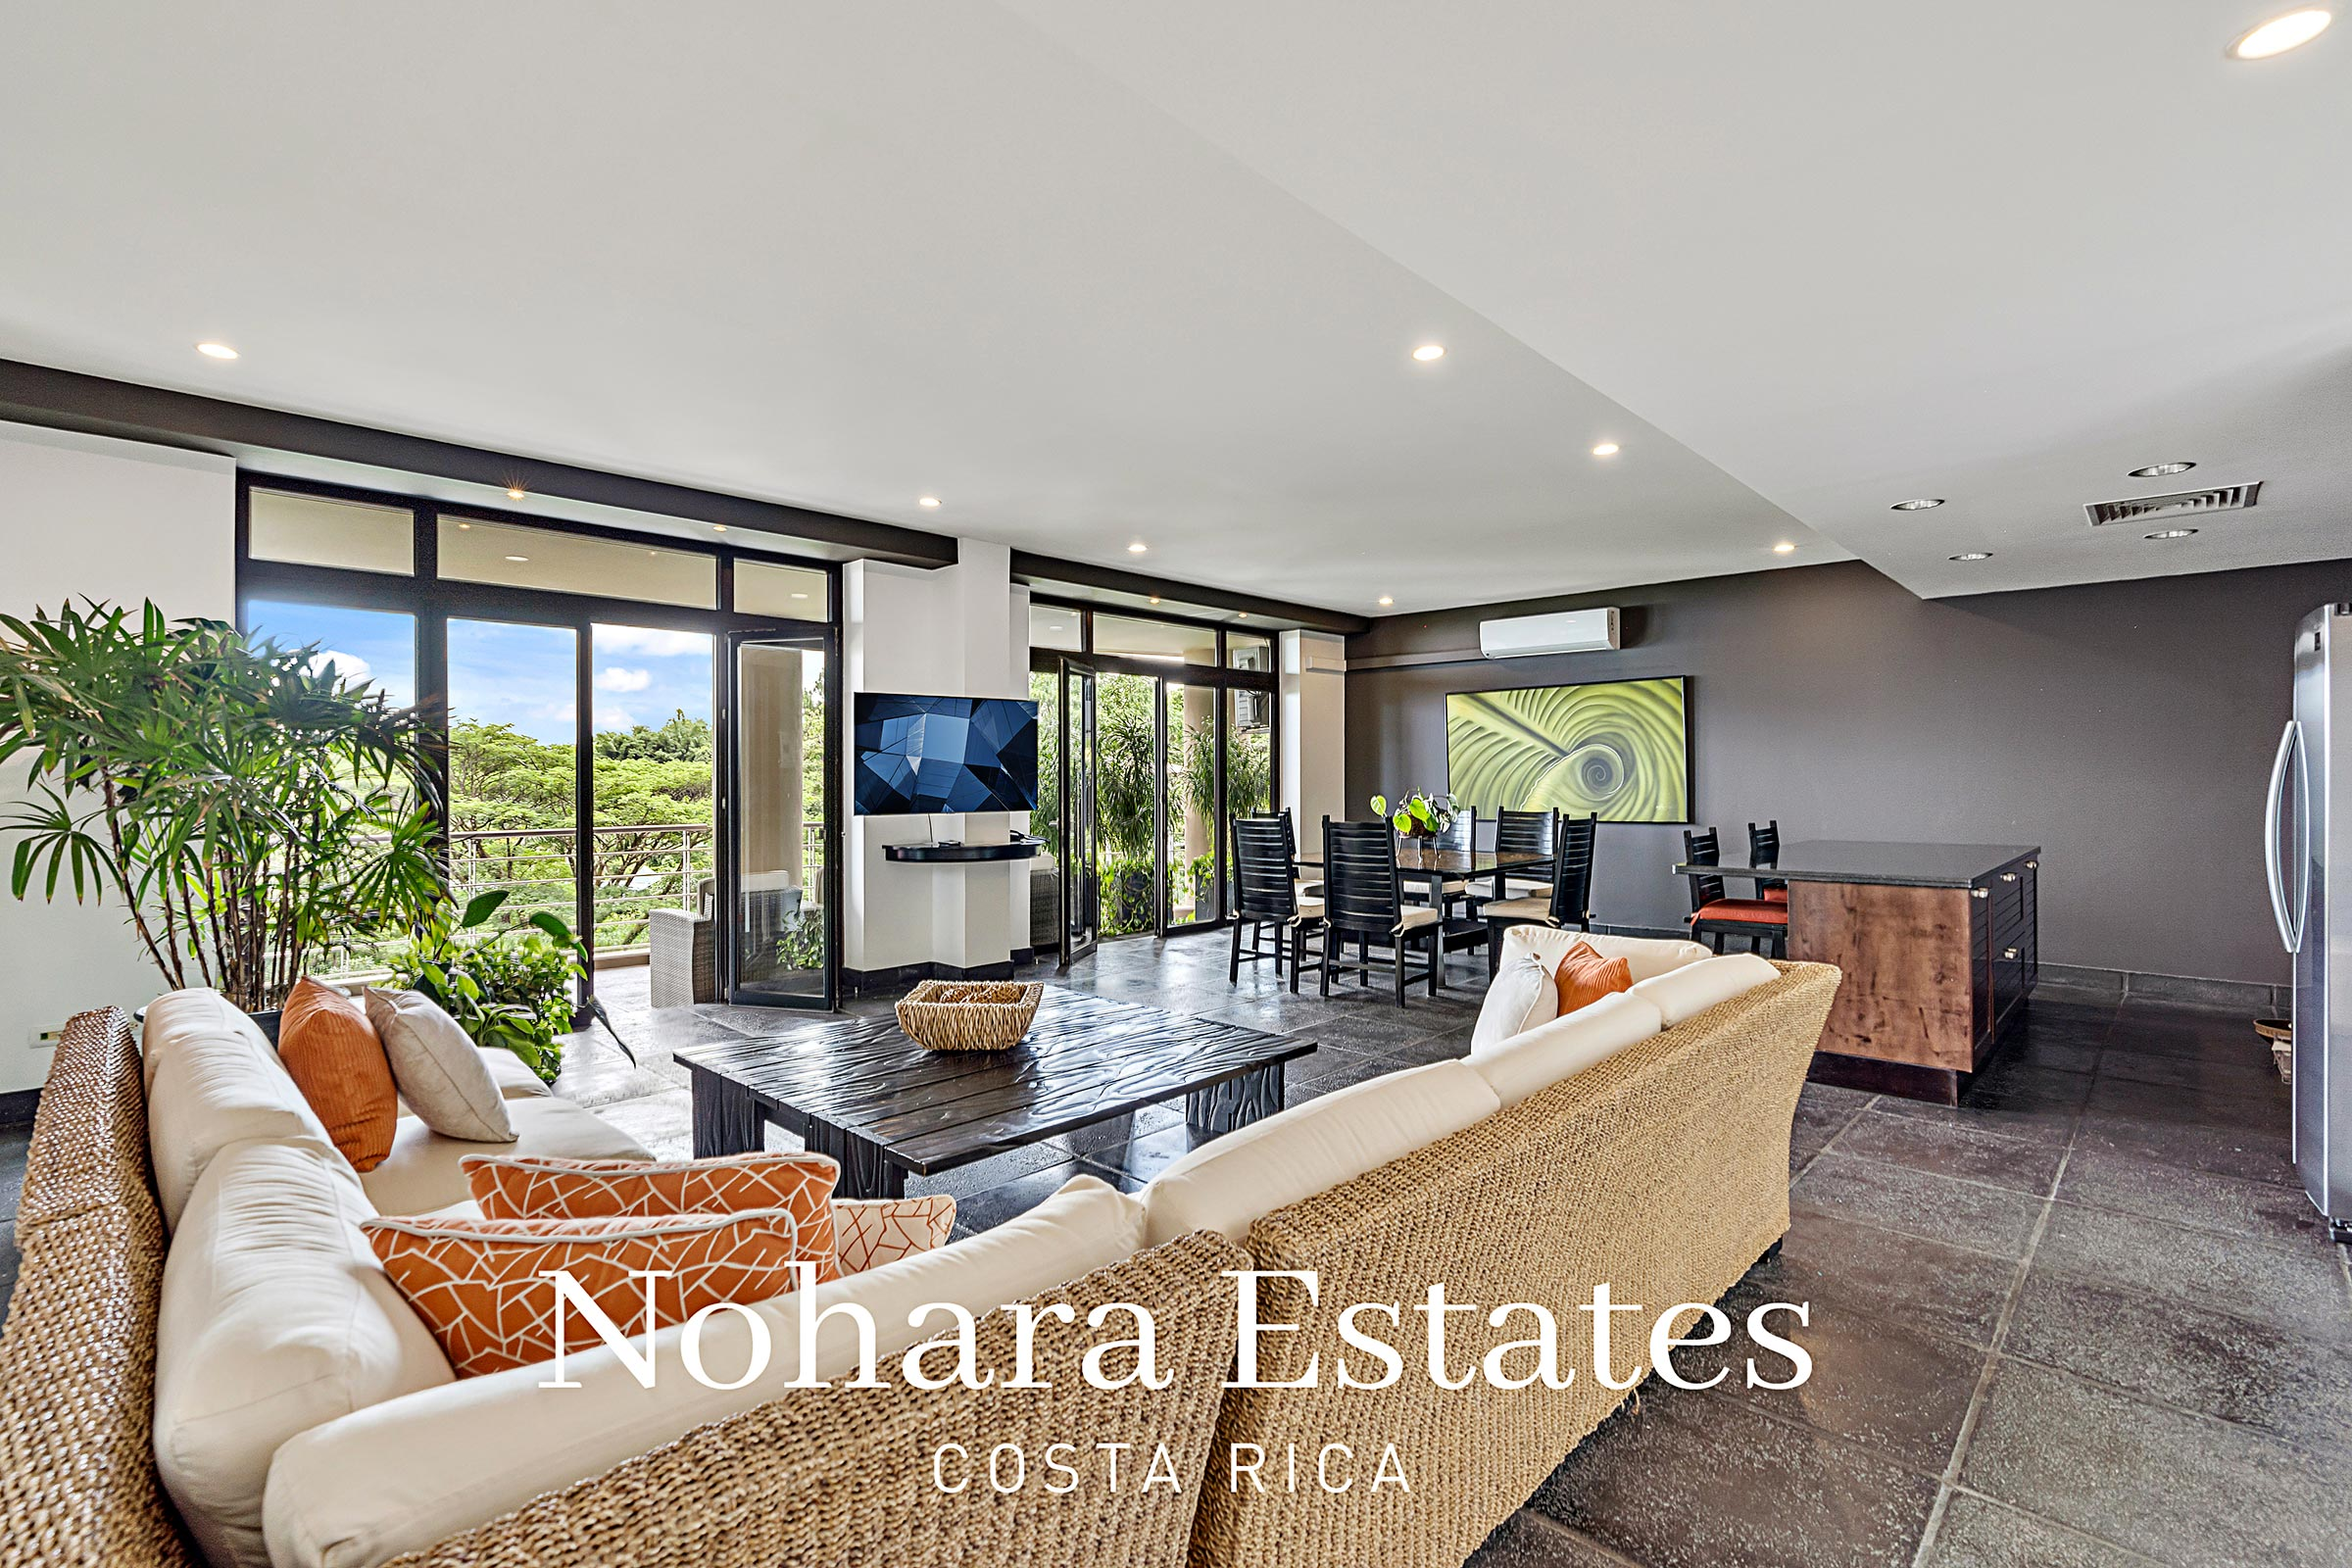 Nohara Estates Costa Rica 122 Apartment Quepos Los Altos 6